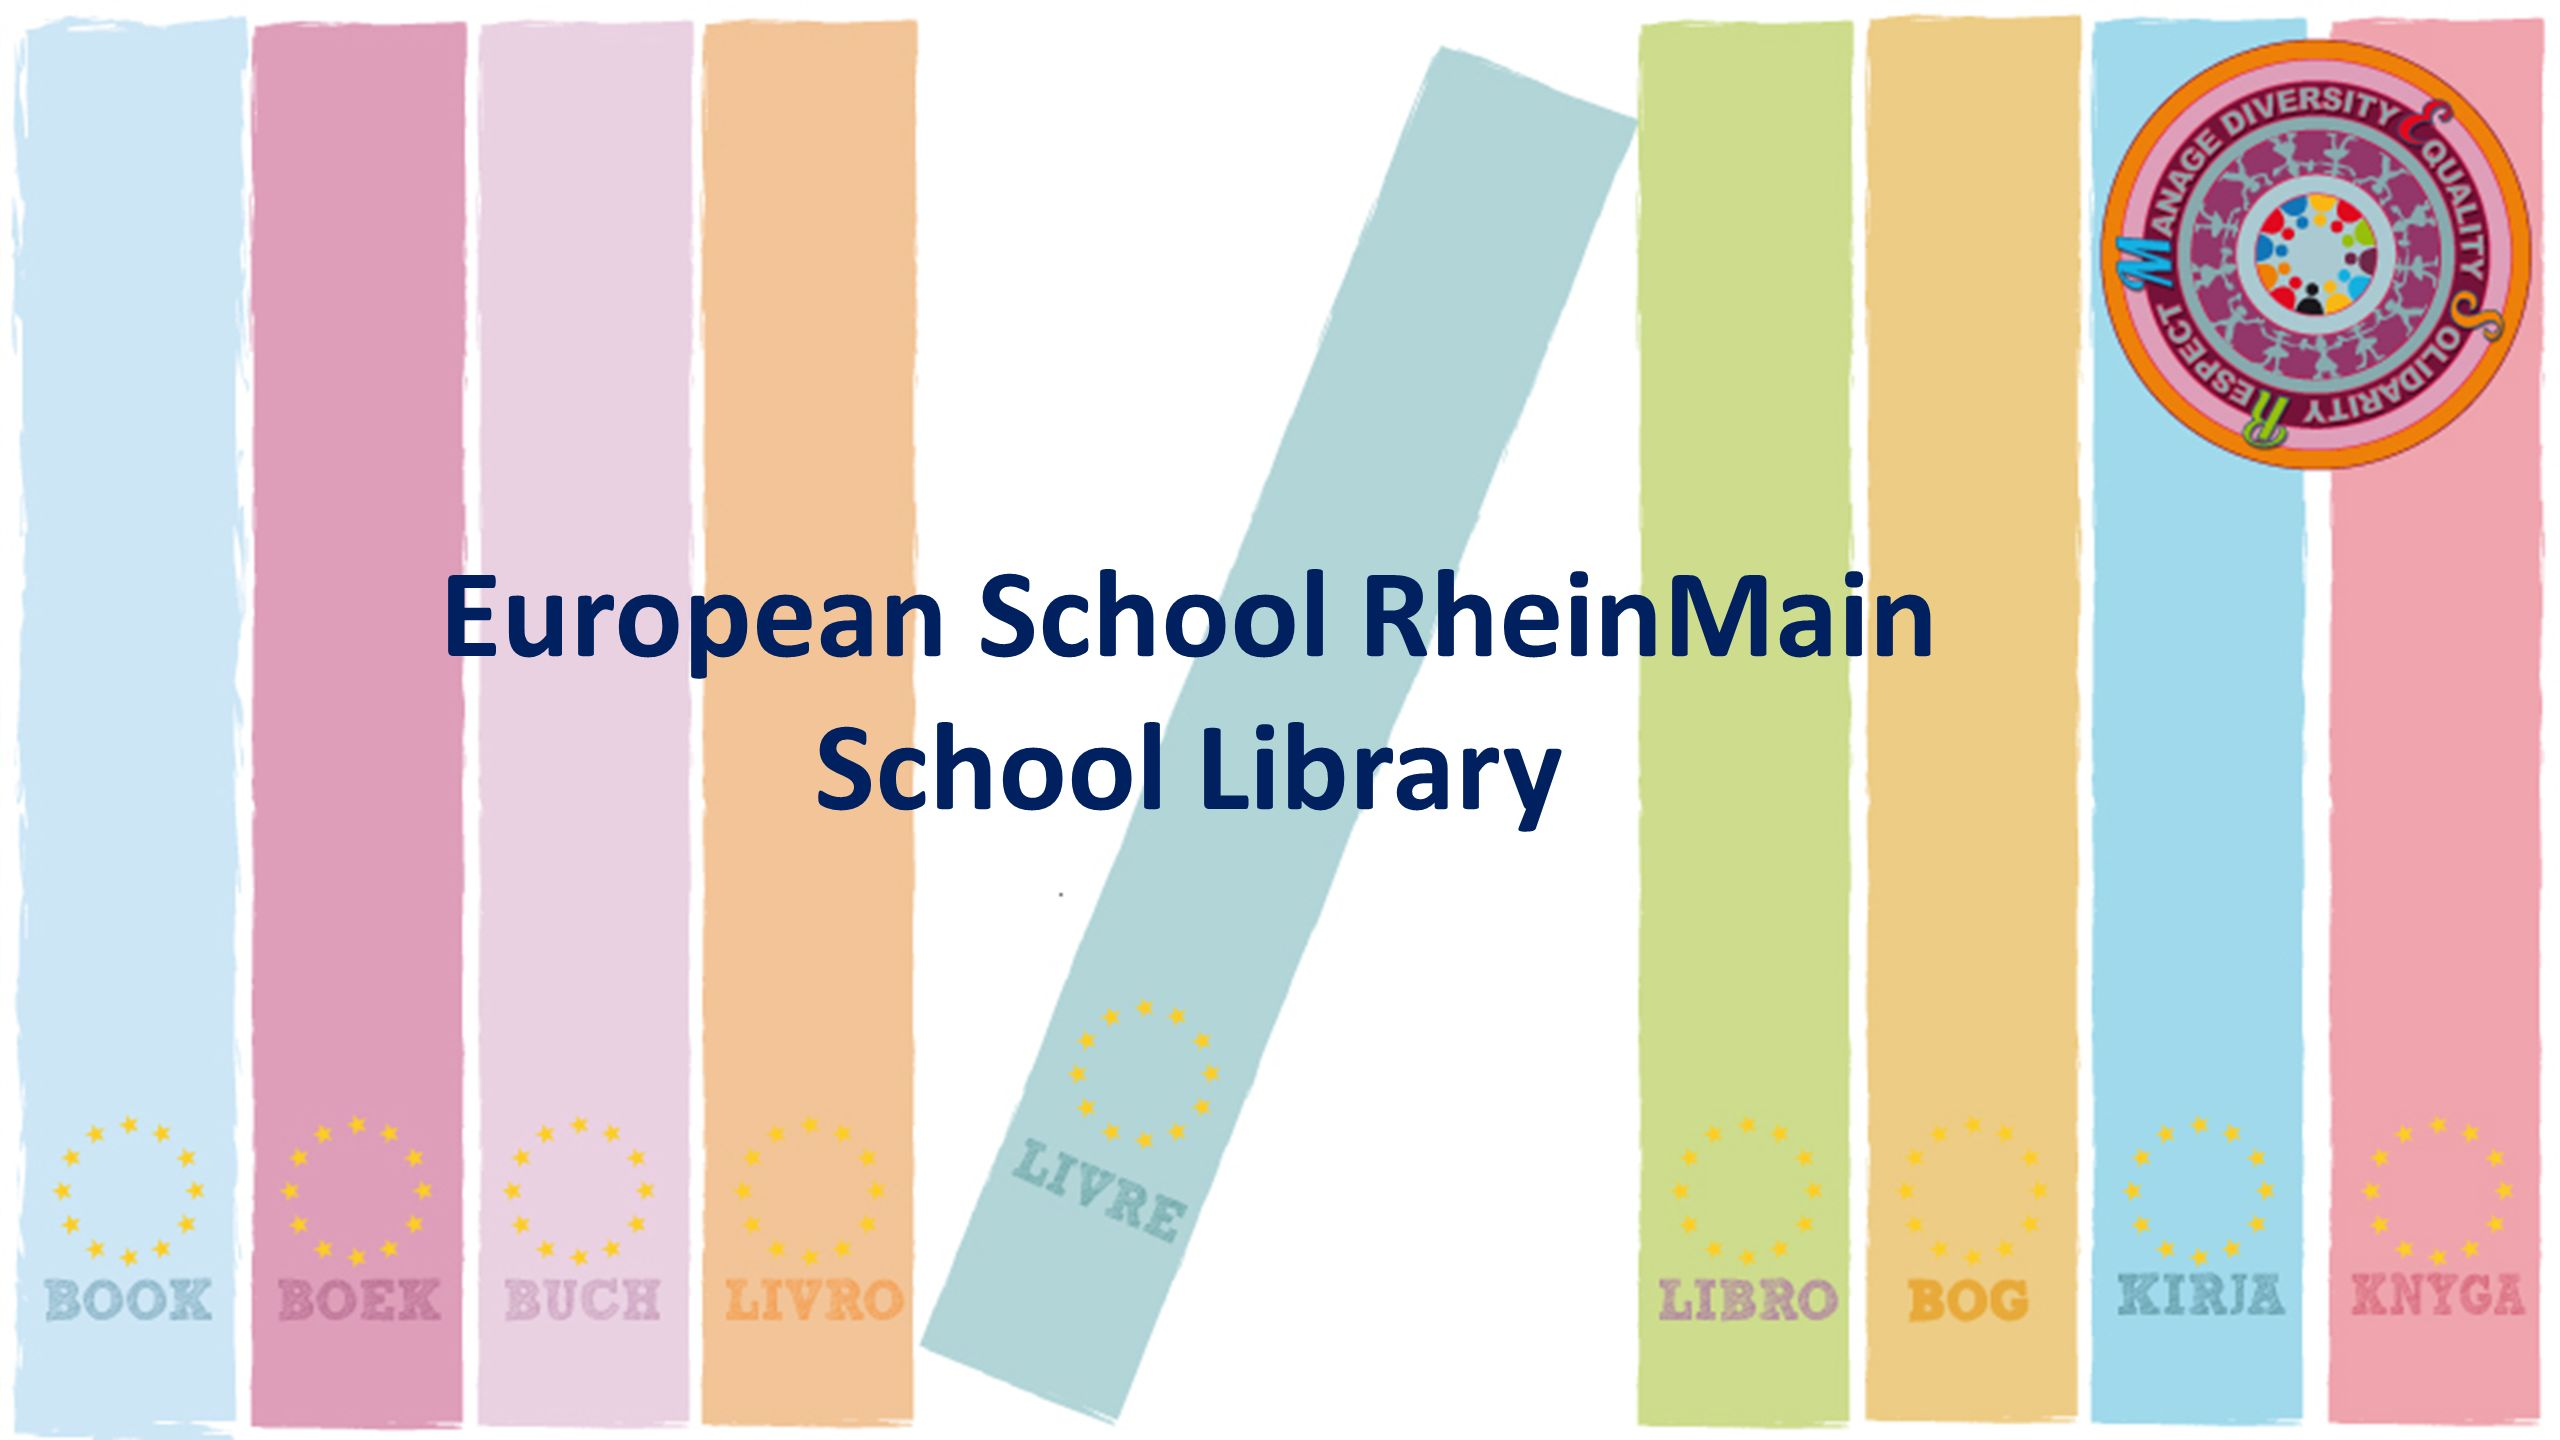 European School RheinMain School Library